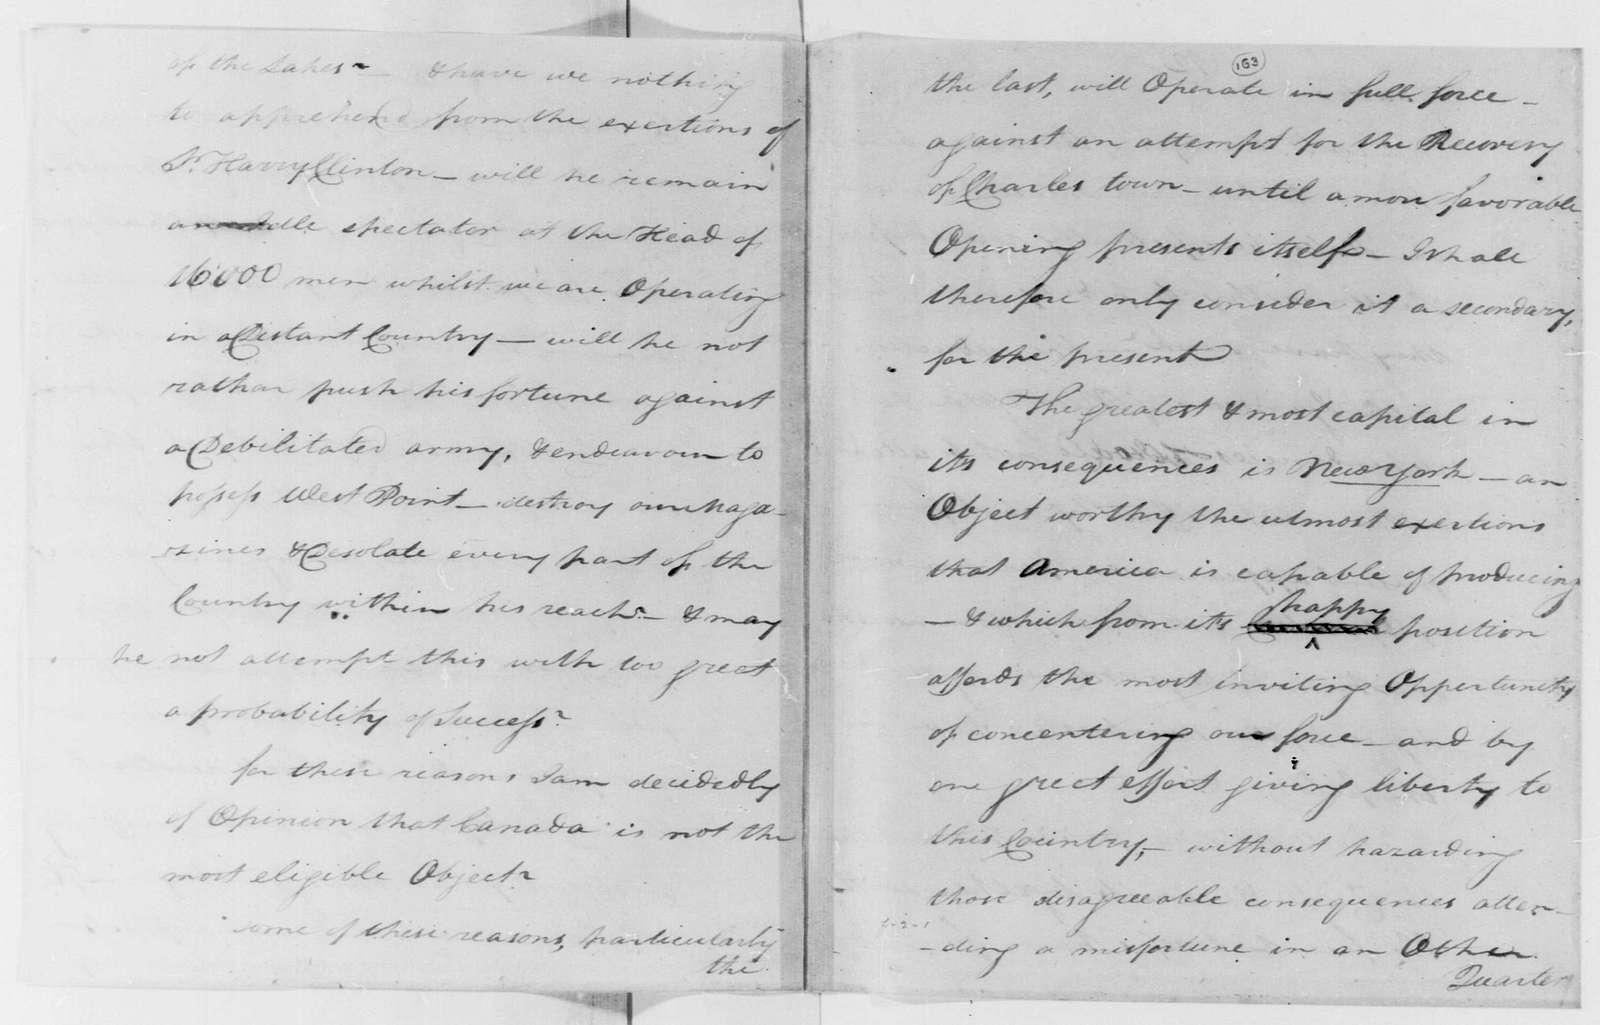 George Washington Papers, Series 4, General Correspondence: Anthony Wayne to George Washington, July 10, 1780